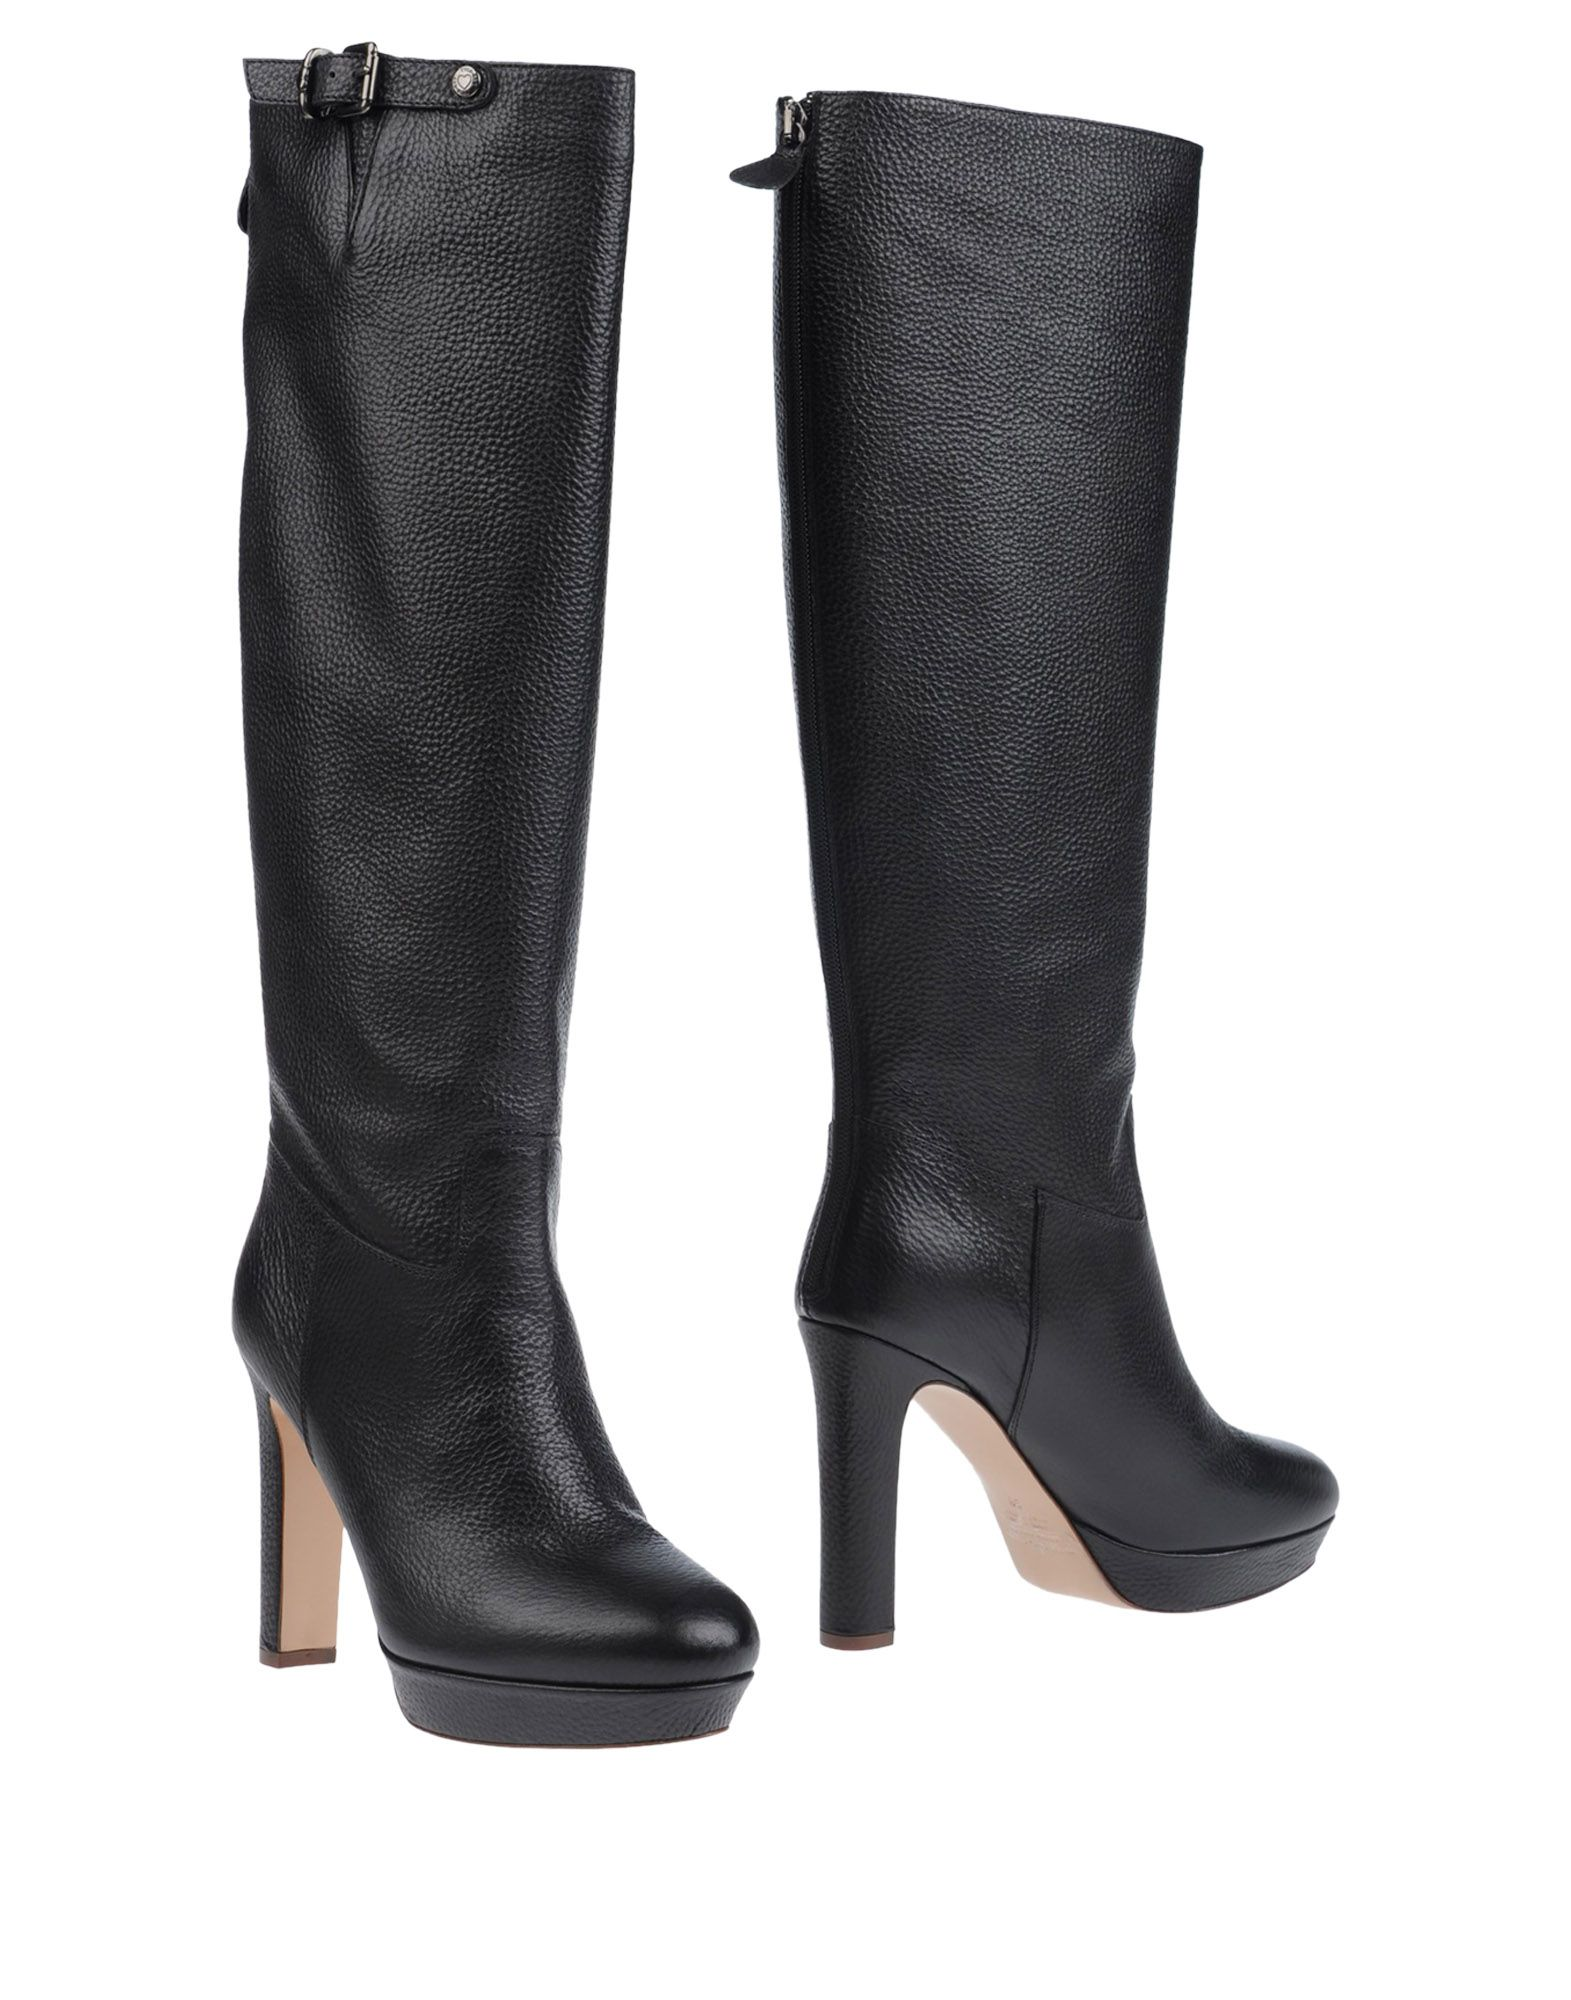 Haltbare 11243877QF Mode billige Schuhe Twin 11243877QF Haltbare Beliebte Schuhe 725629